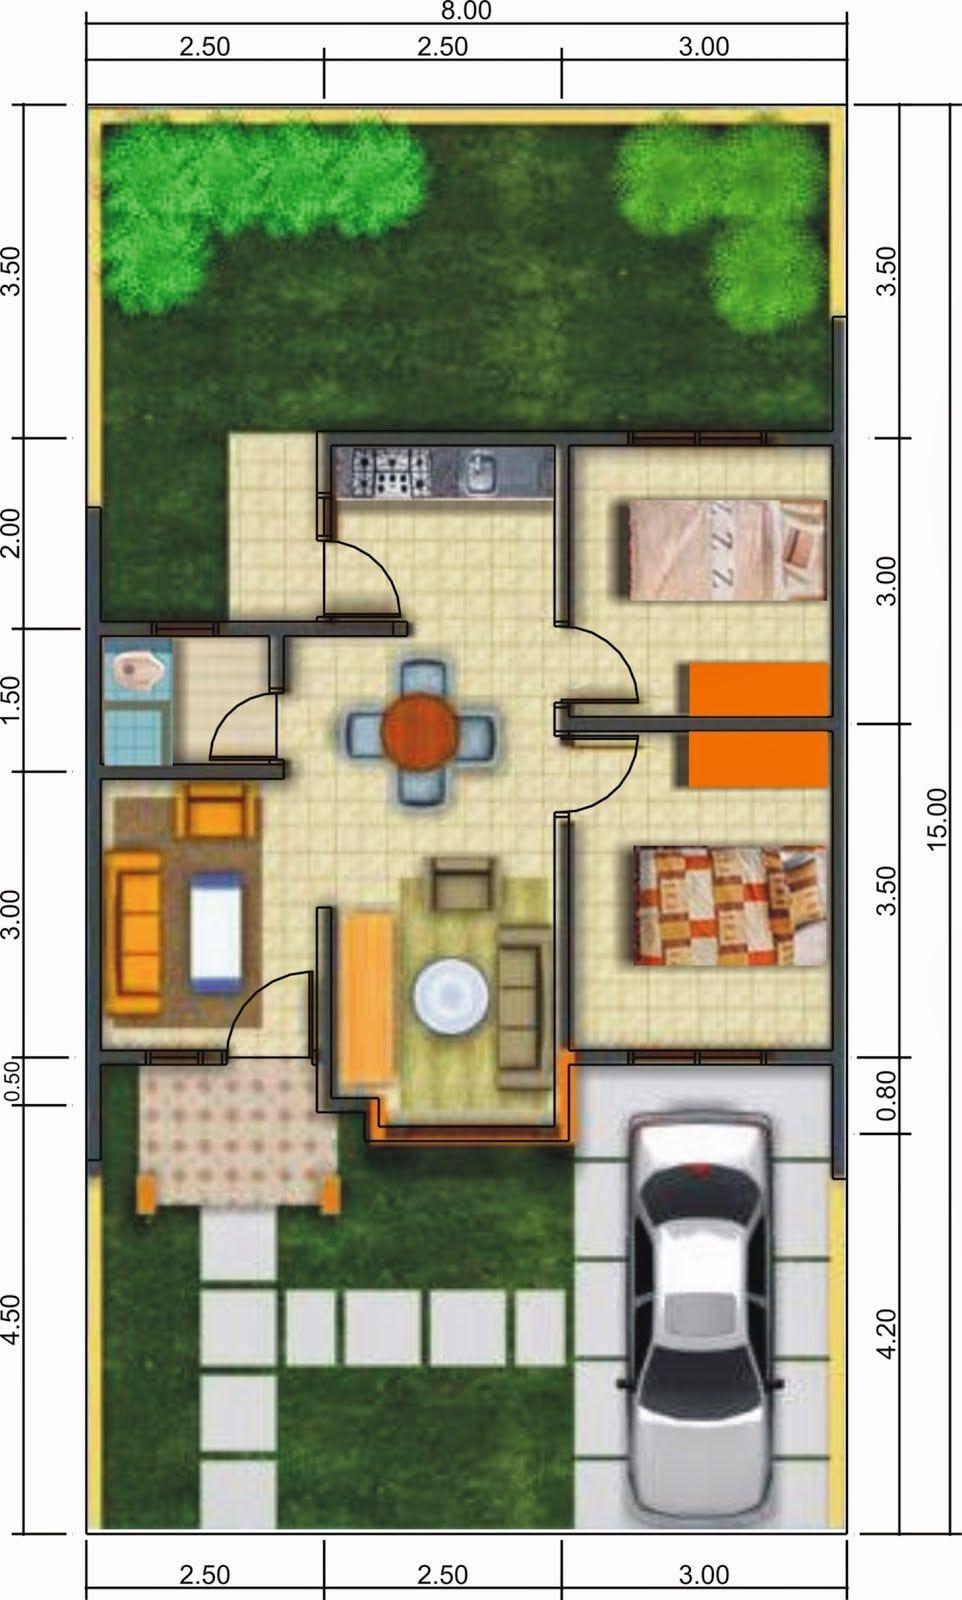 Desain Denah Rumah Sederhana Modern Design Your Dream House Small House Design Minimalist House Design